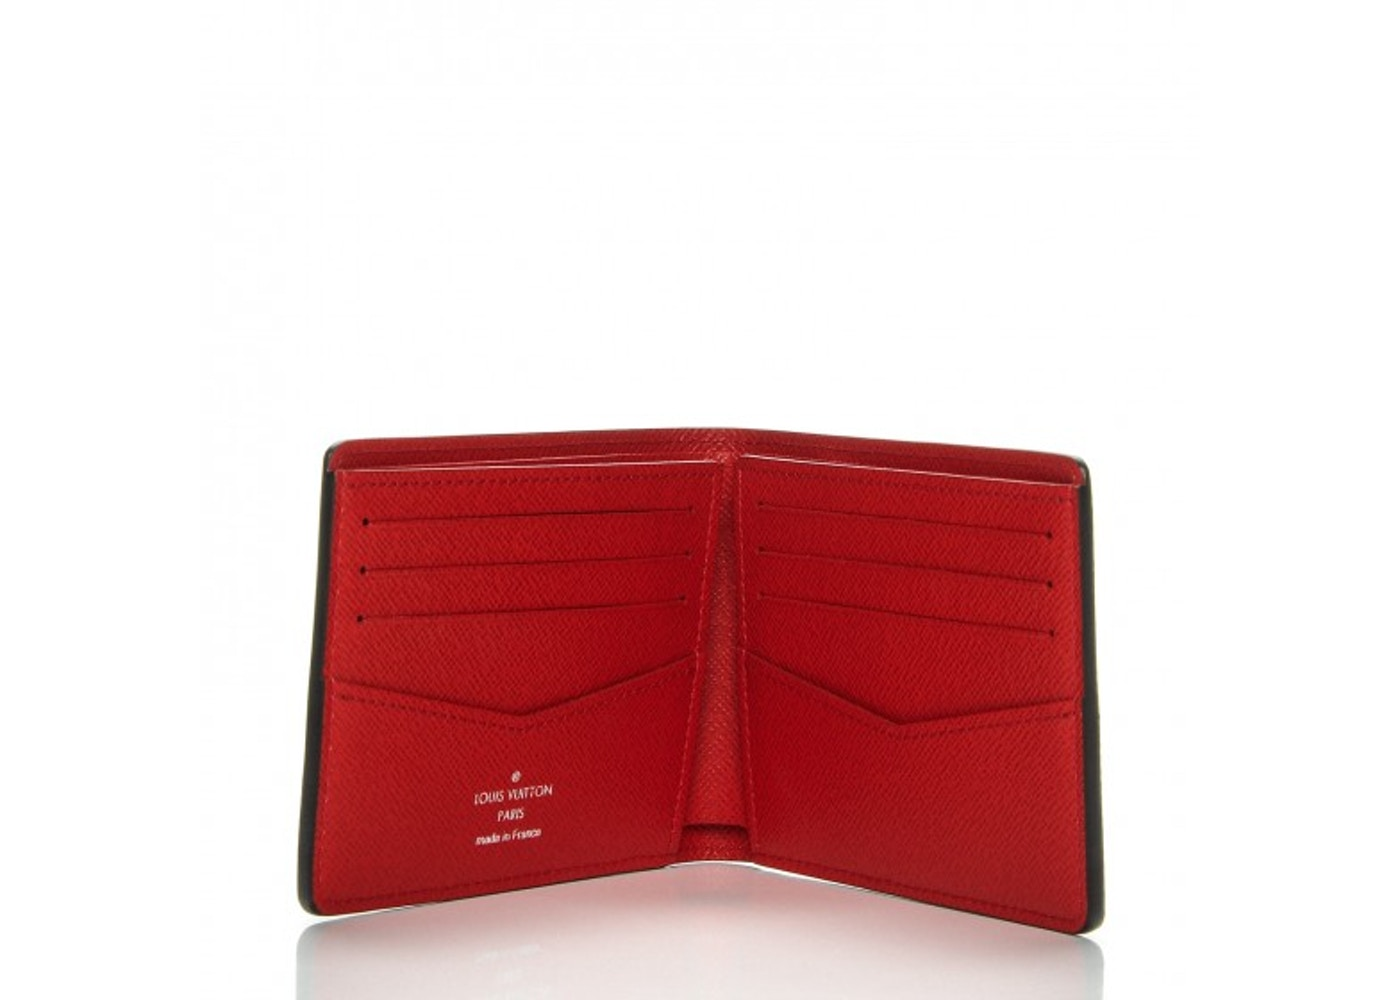 Ongebruikt Louis Vuitton x Supreme Slender Wallet Epi Red EK-56